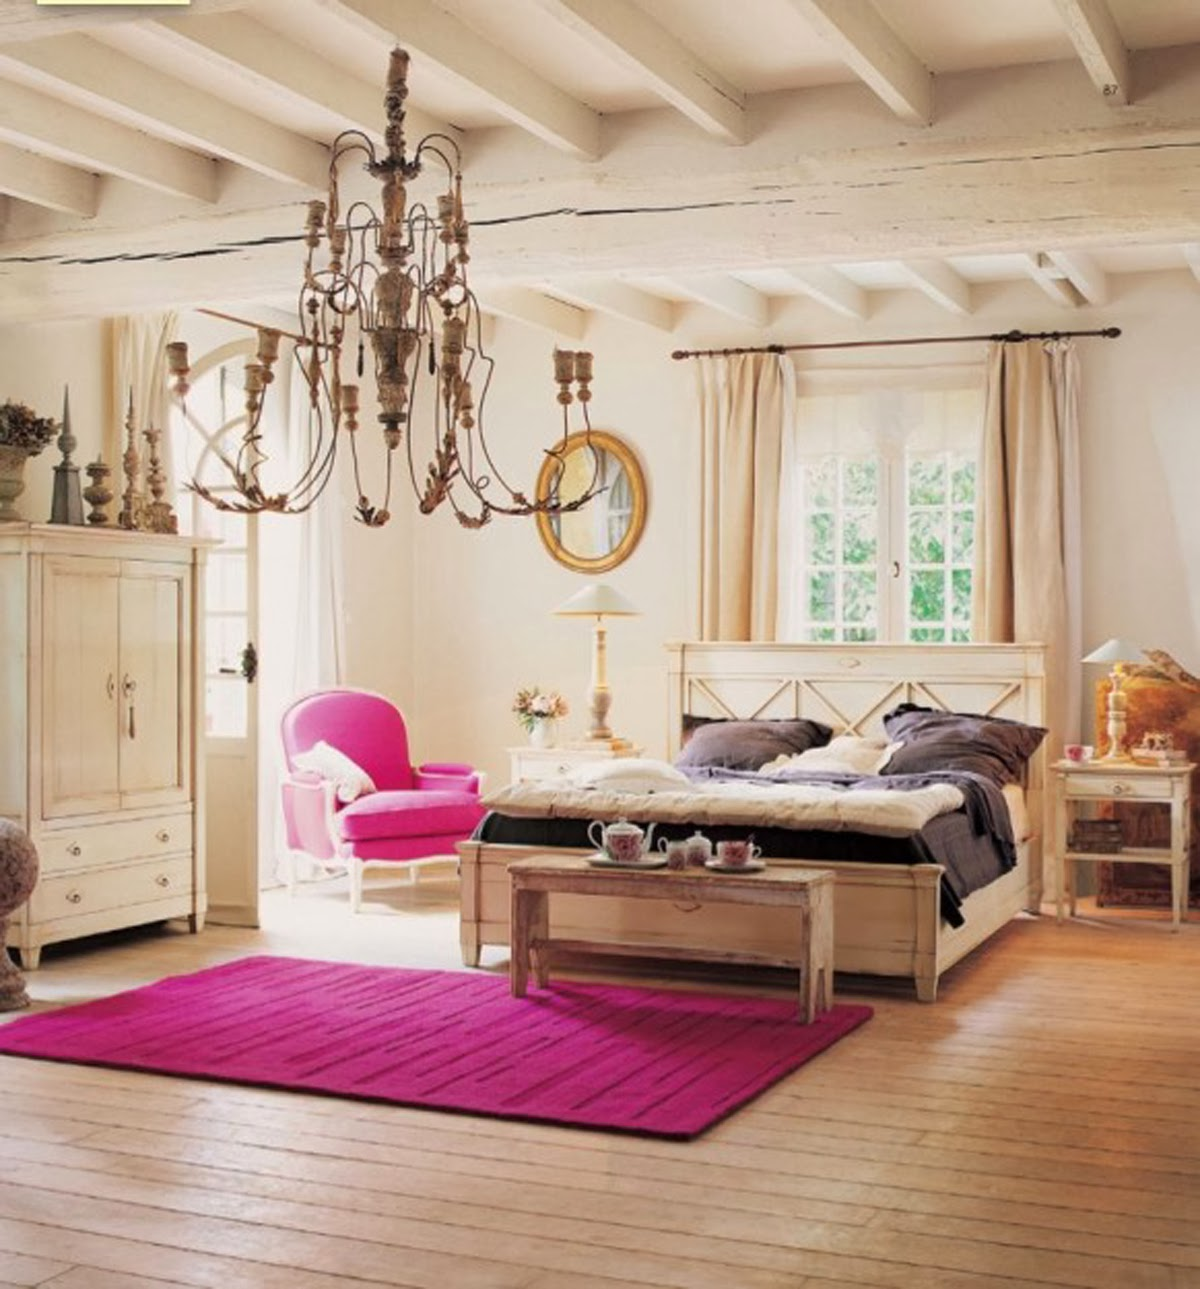 Pint Carpet elegant Golden interiors